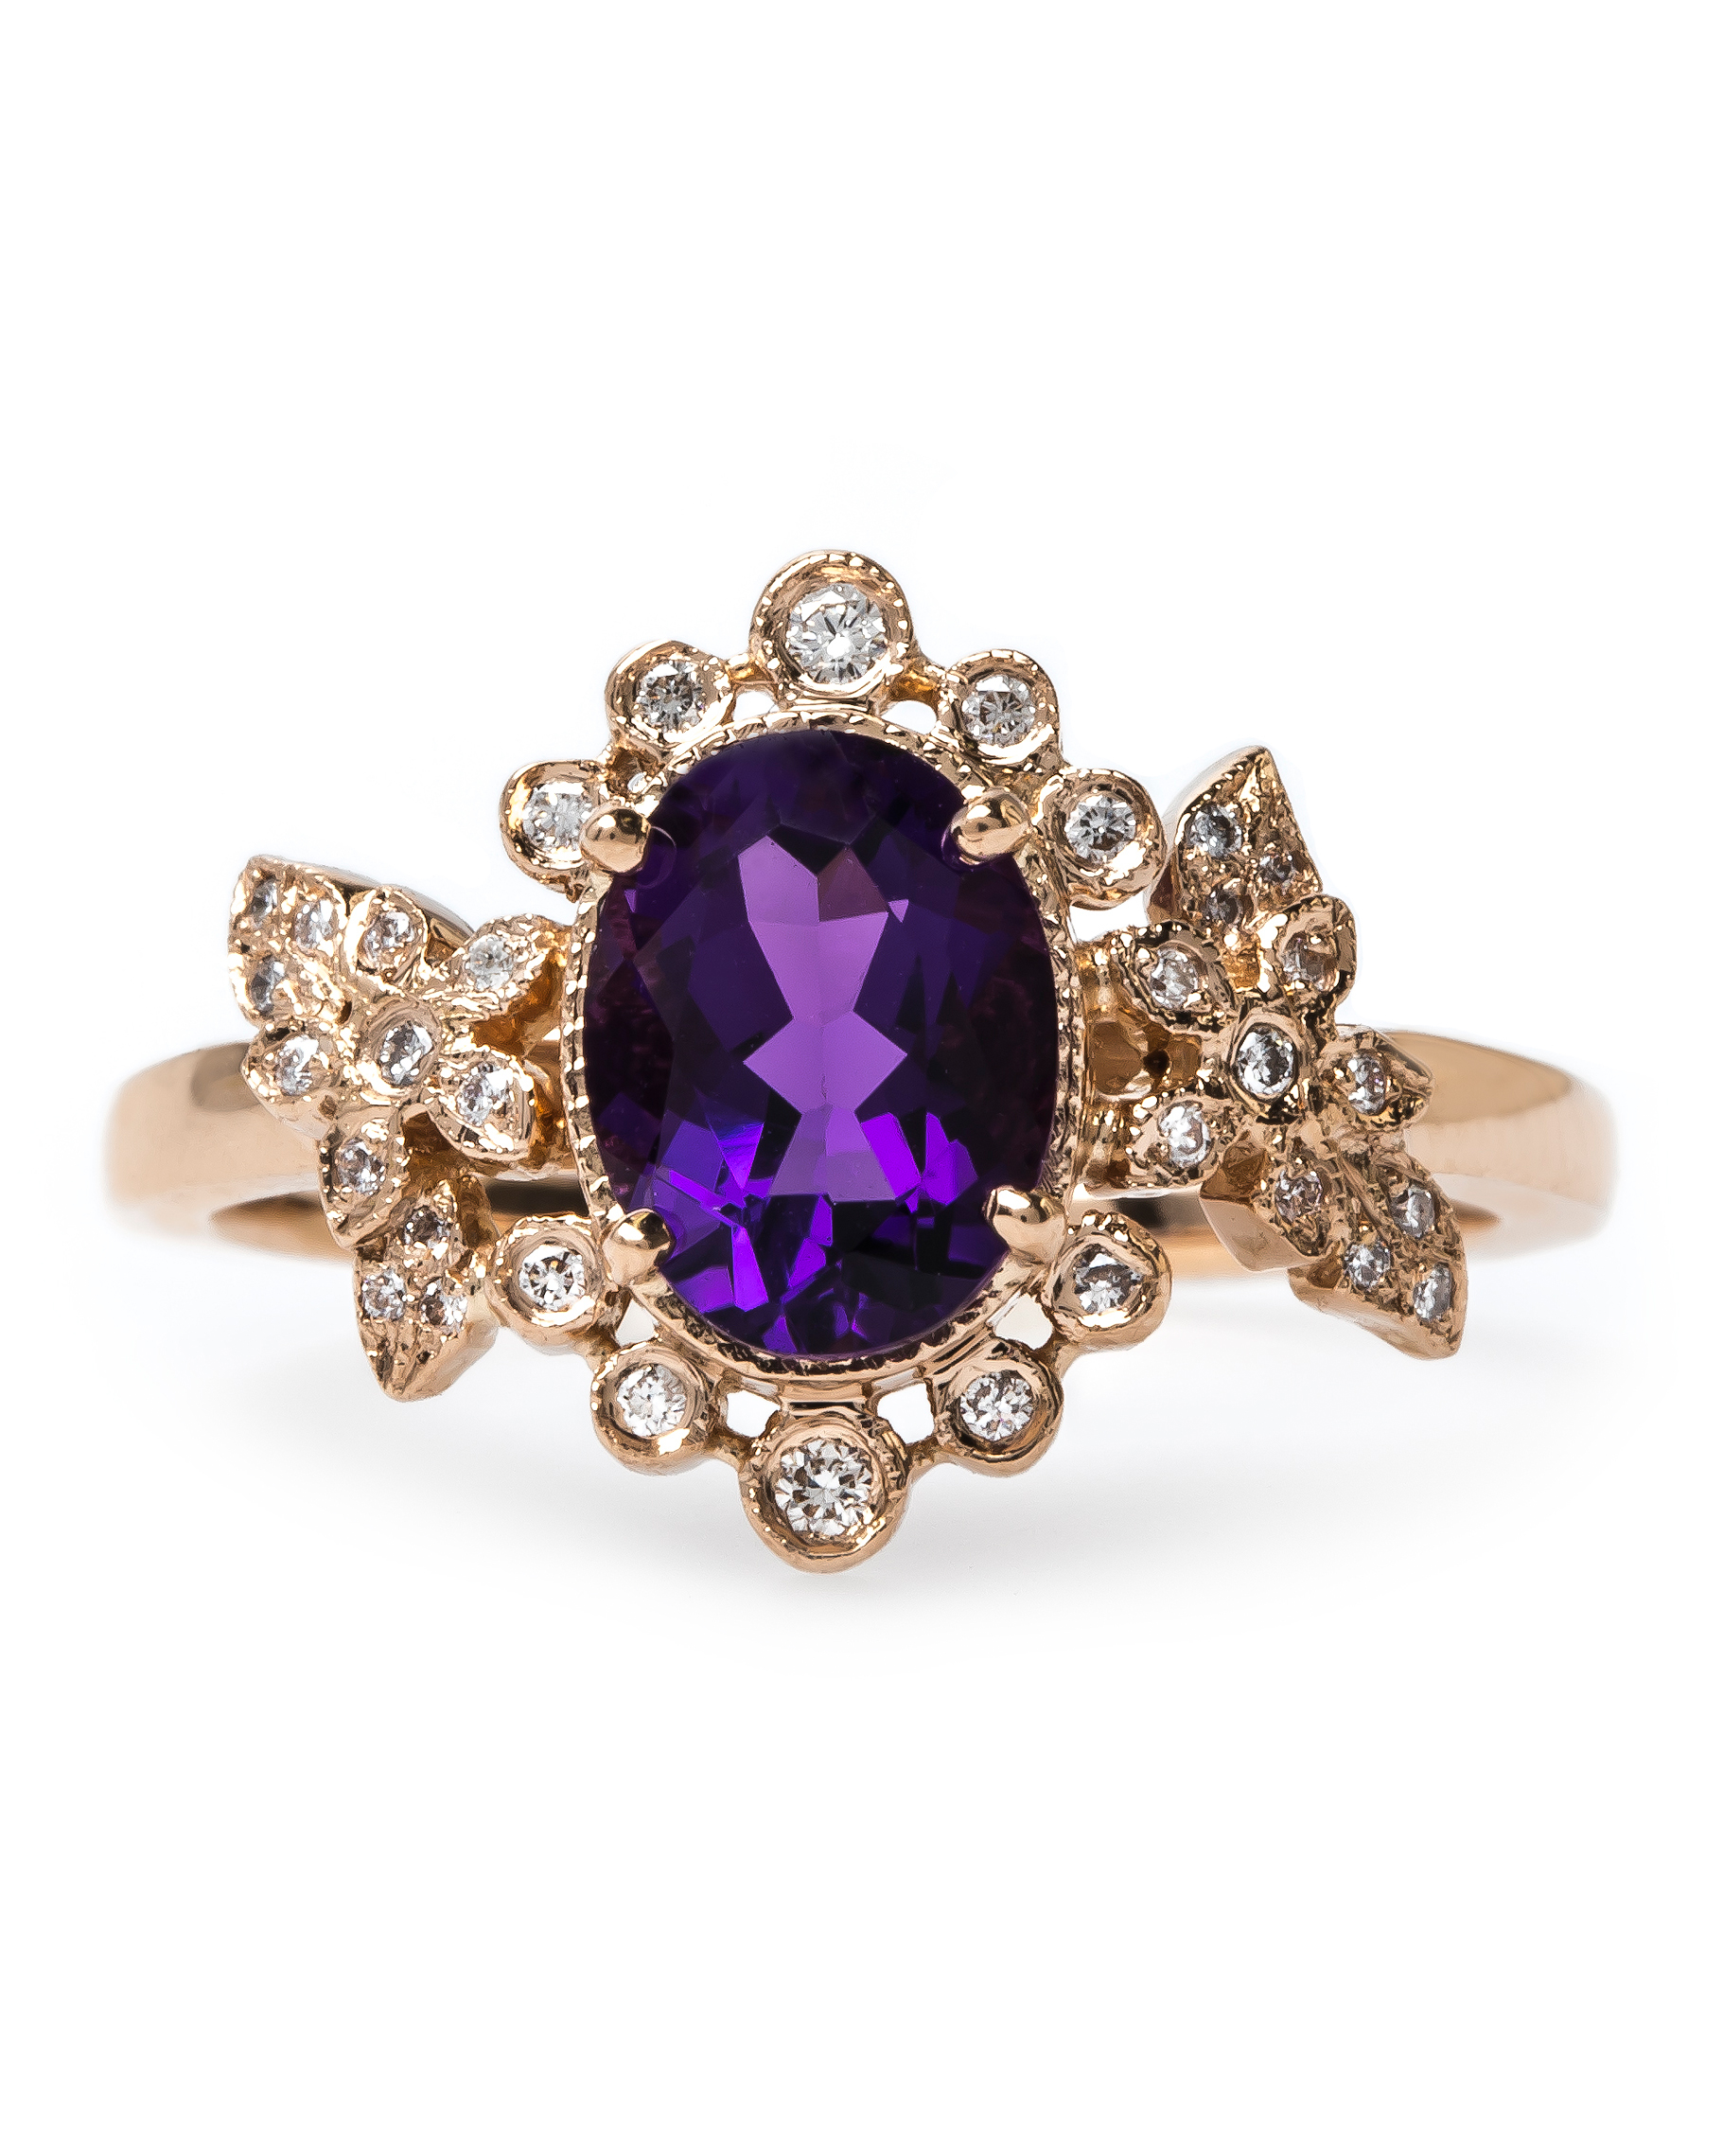 claire-pettibone-ring-collection-thalia-0915.jpg